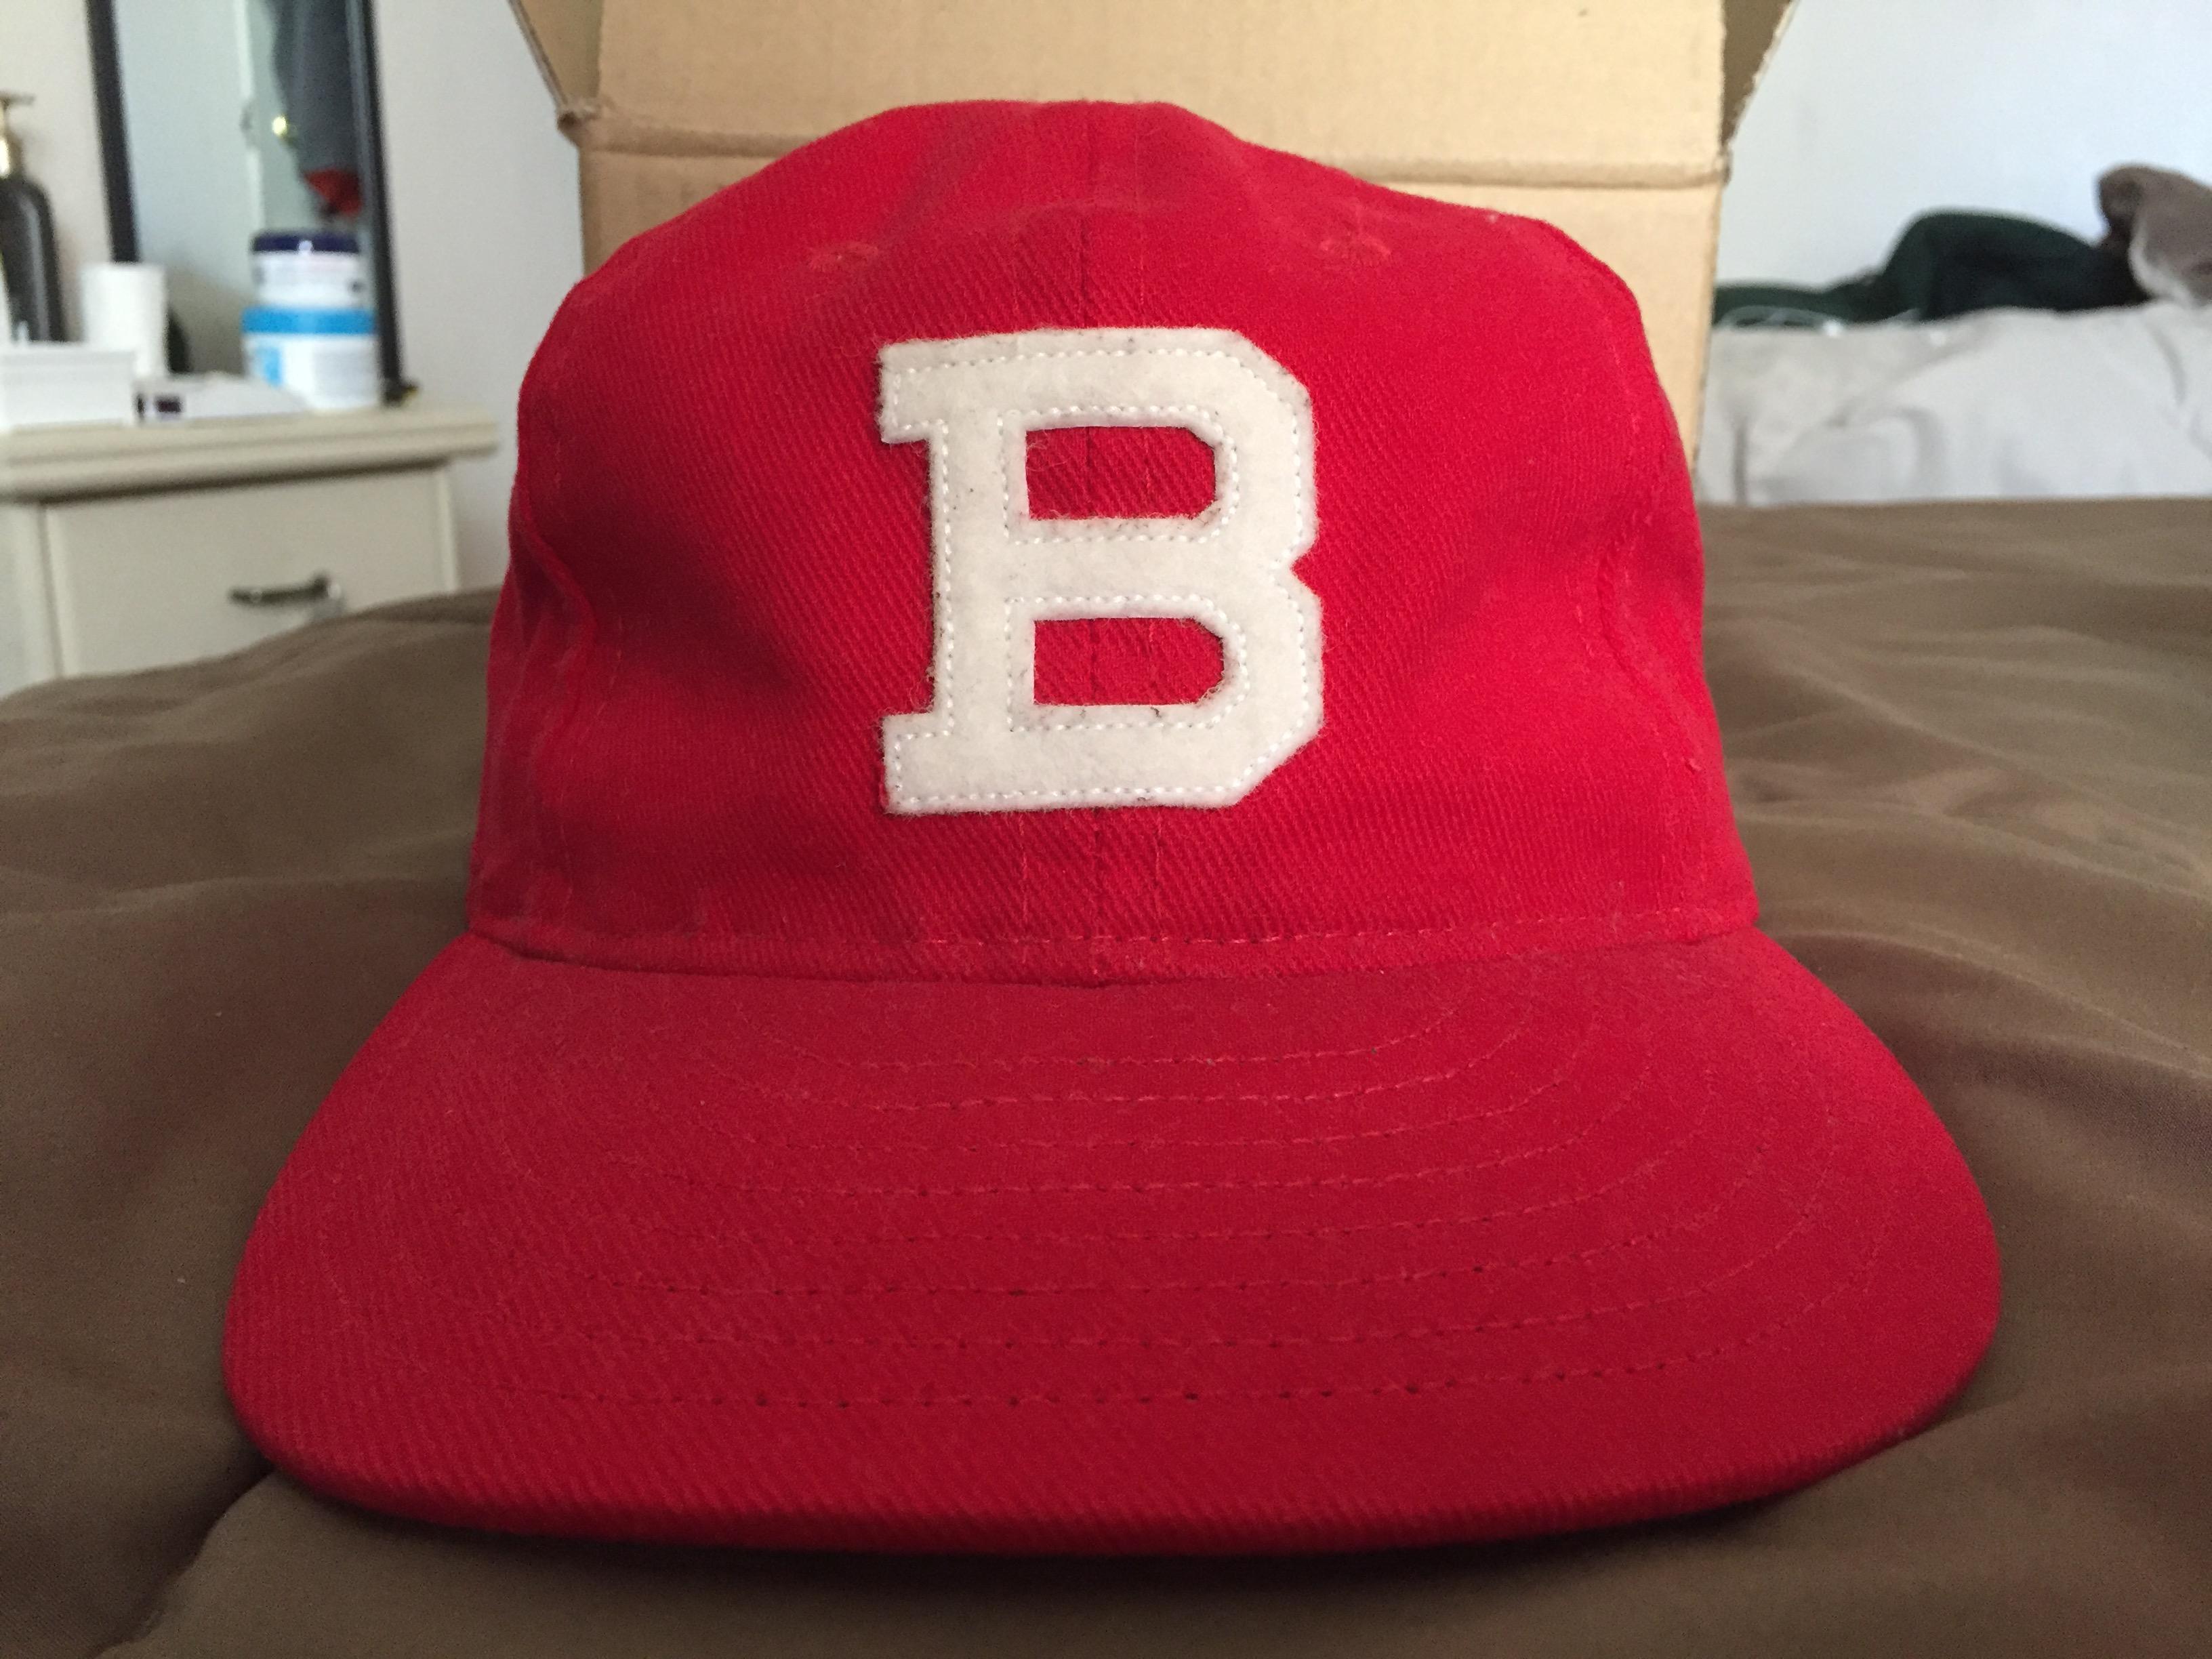 78d83194b0a2a J.Crew Brooklyn Bushwicks Ball Cap Size one size - Hats for Sale ...